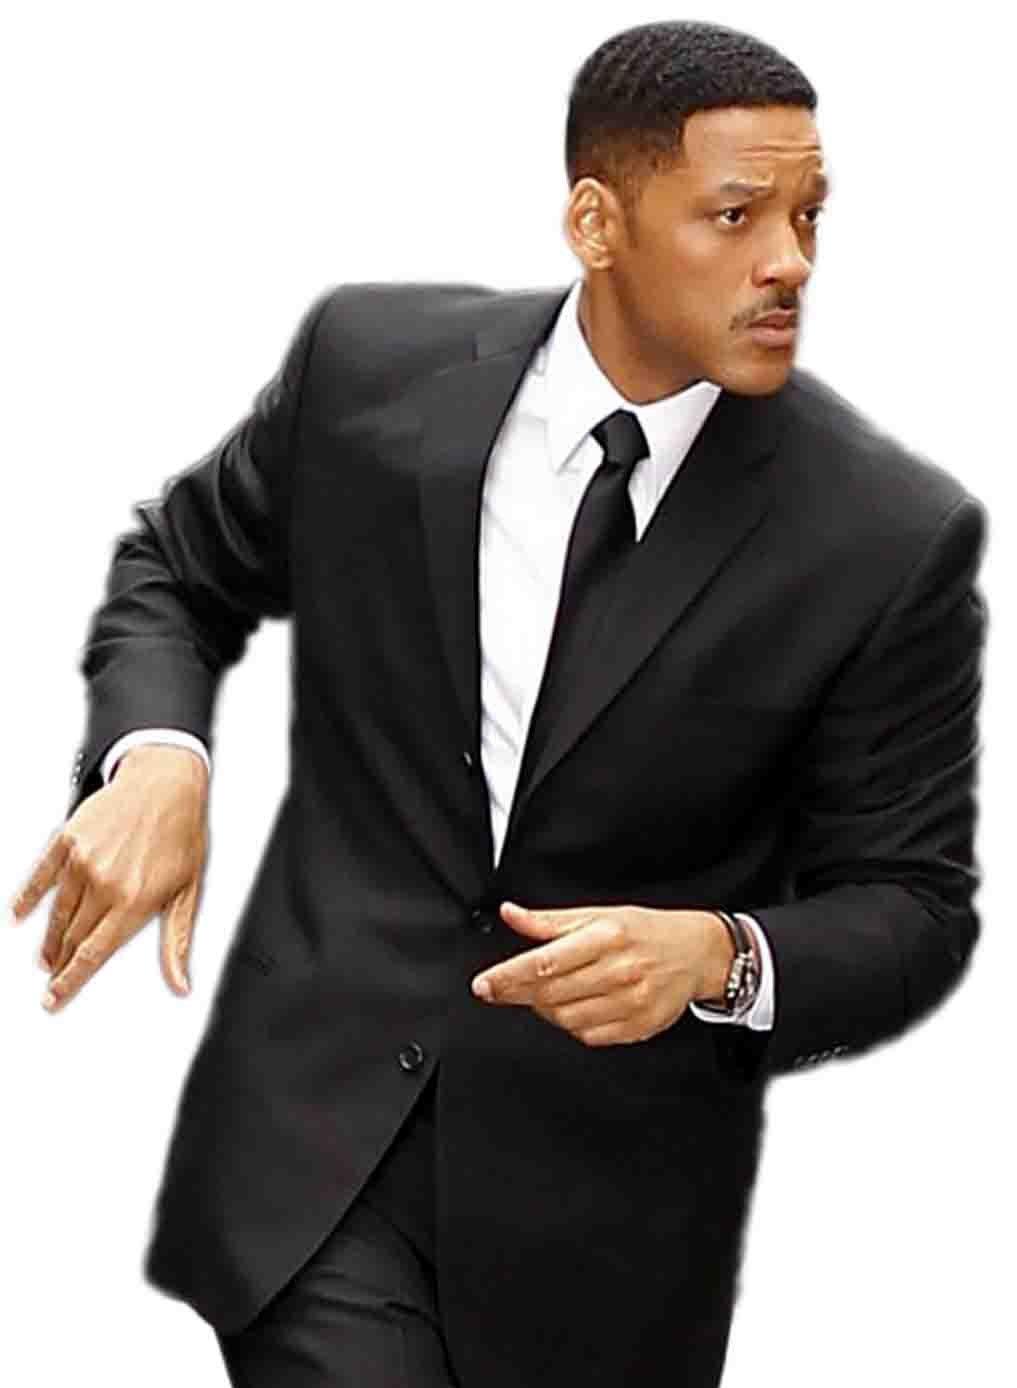 Will Smith Men in Black Suit 01